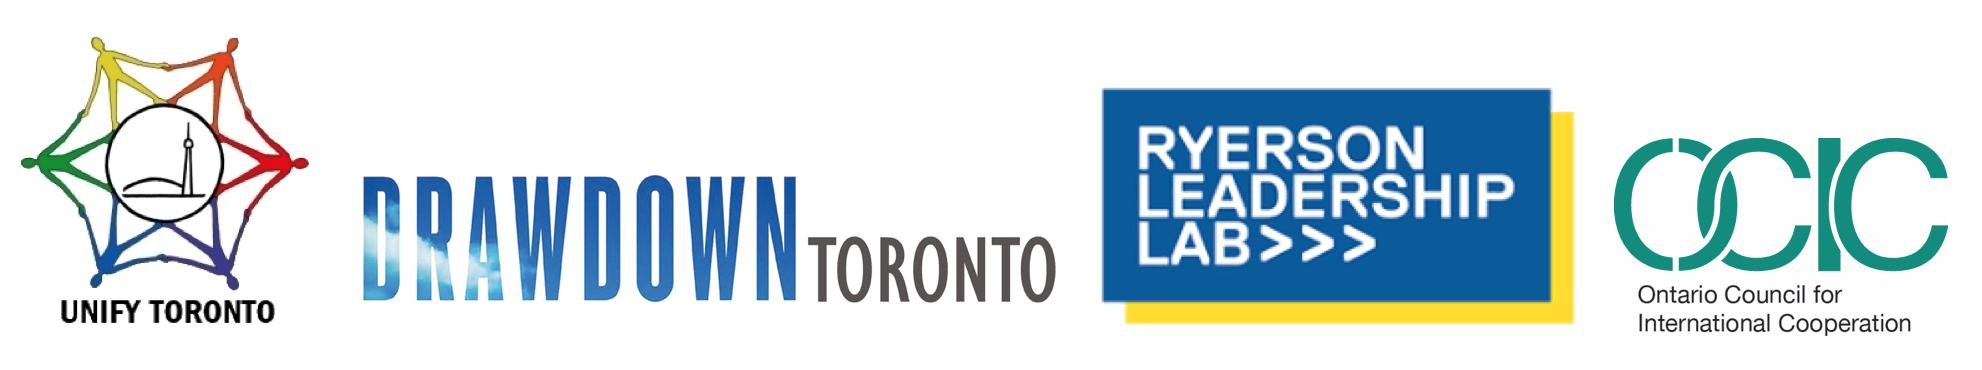 organizers logos: Unify Toronto, Drawdown Toronto, Ryerson Leadership Lab, OCIC